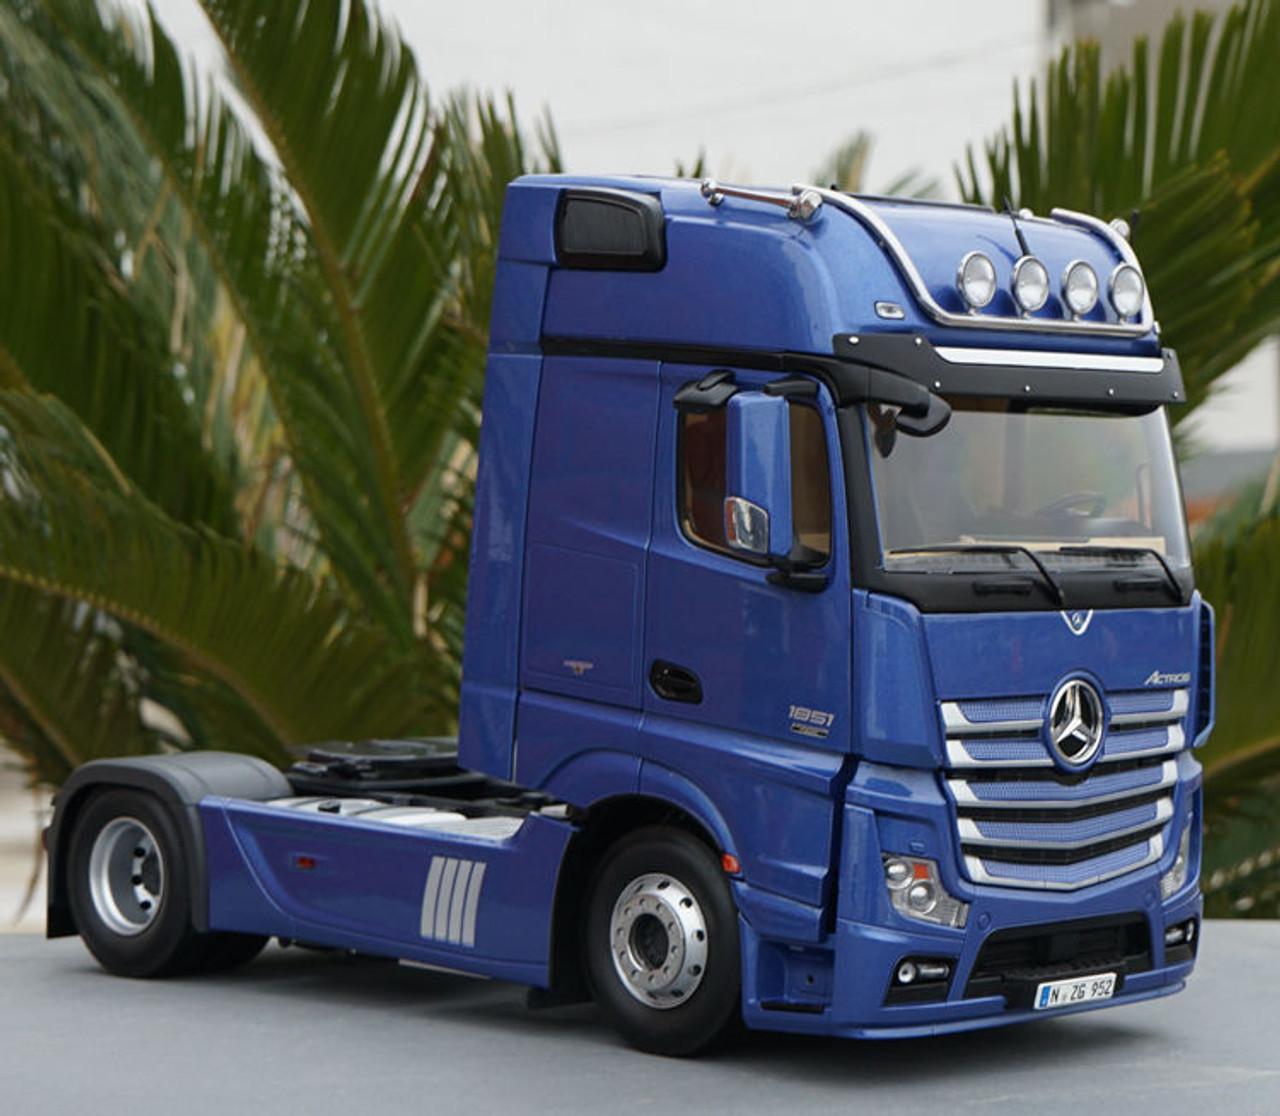 1/18 NZG Mercedes-Benz Actros FH25 Gigaspace 4x2 Heavy Duty Truck Head (Blue) Diecast Model